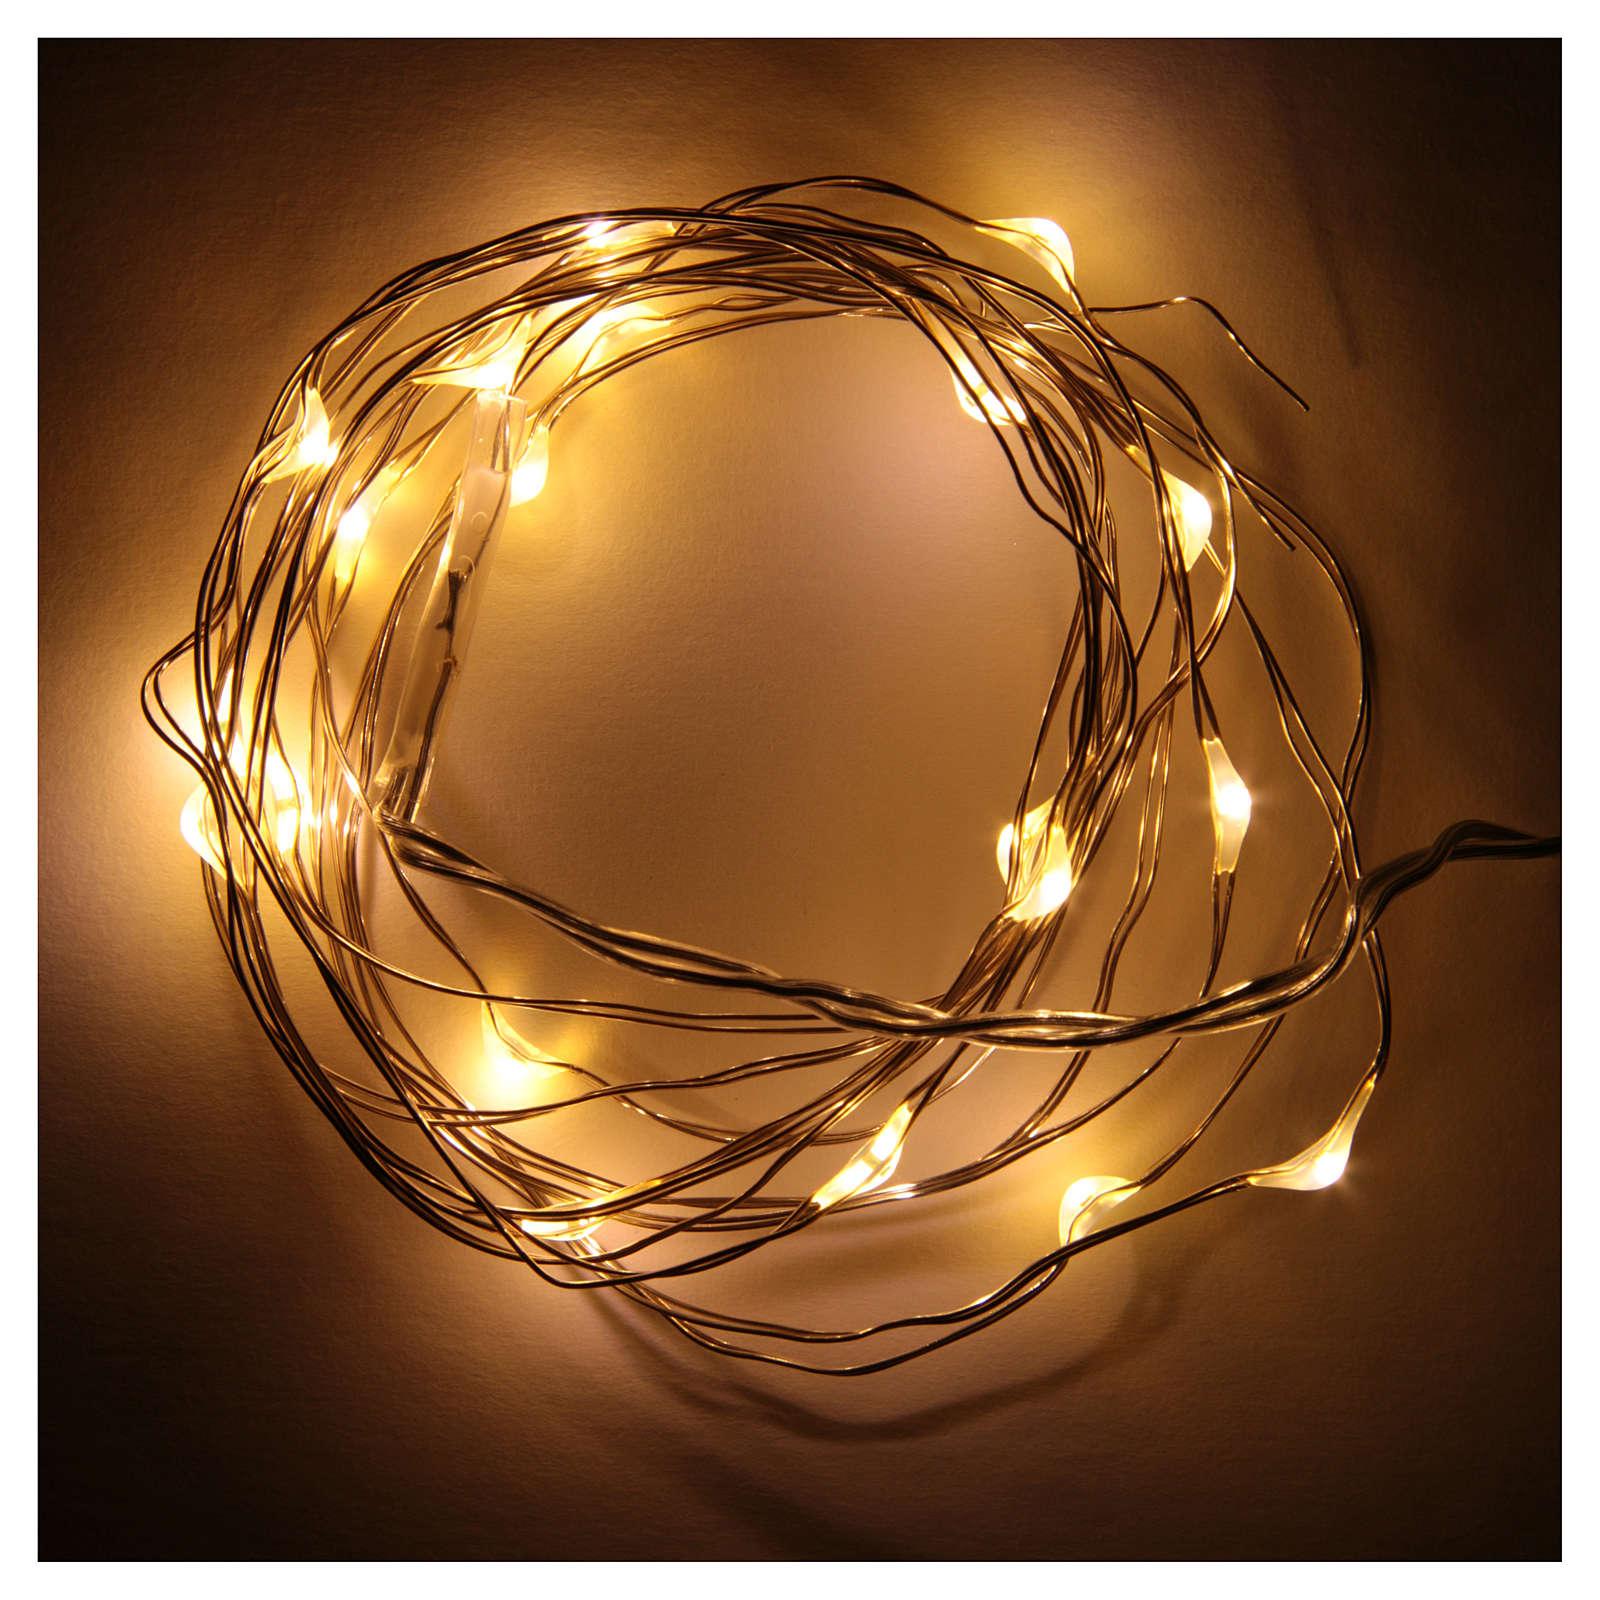 Luces de Navidad 20 LED tipo gota color blanco cálido con baterías y cable a vista 3